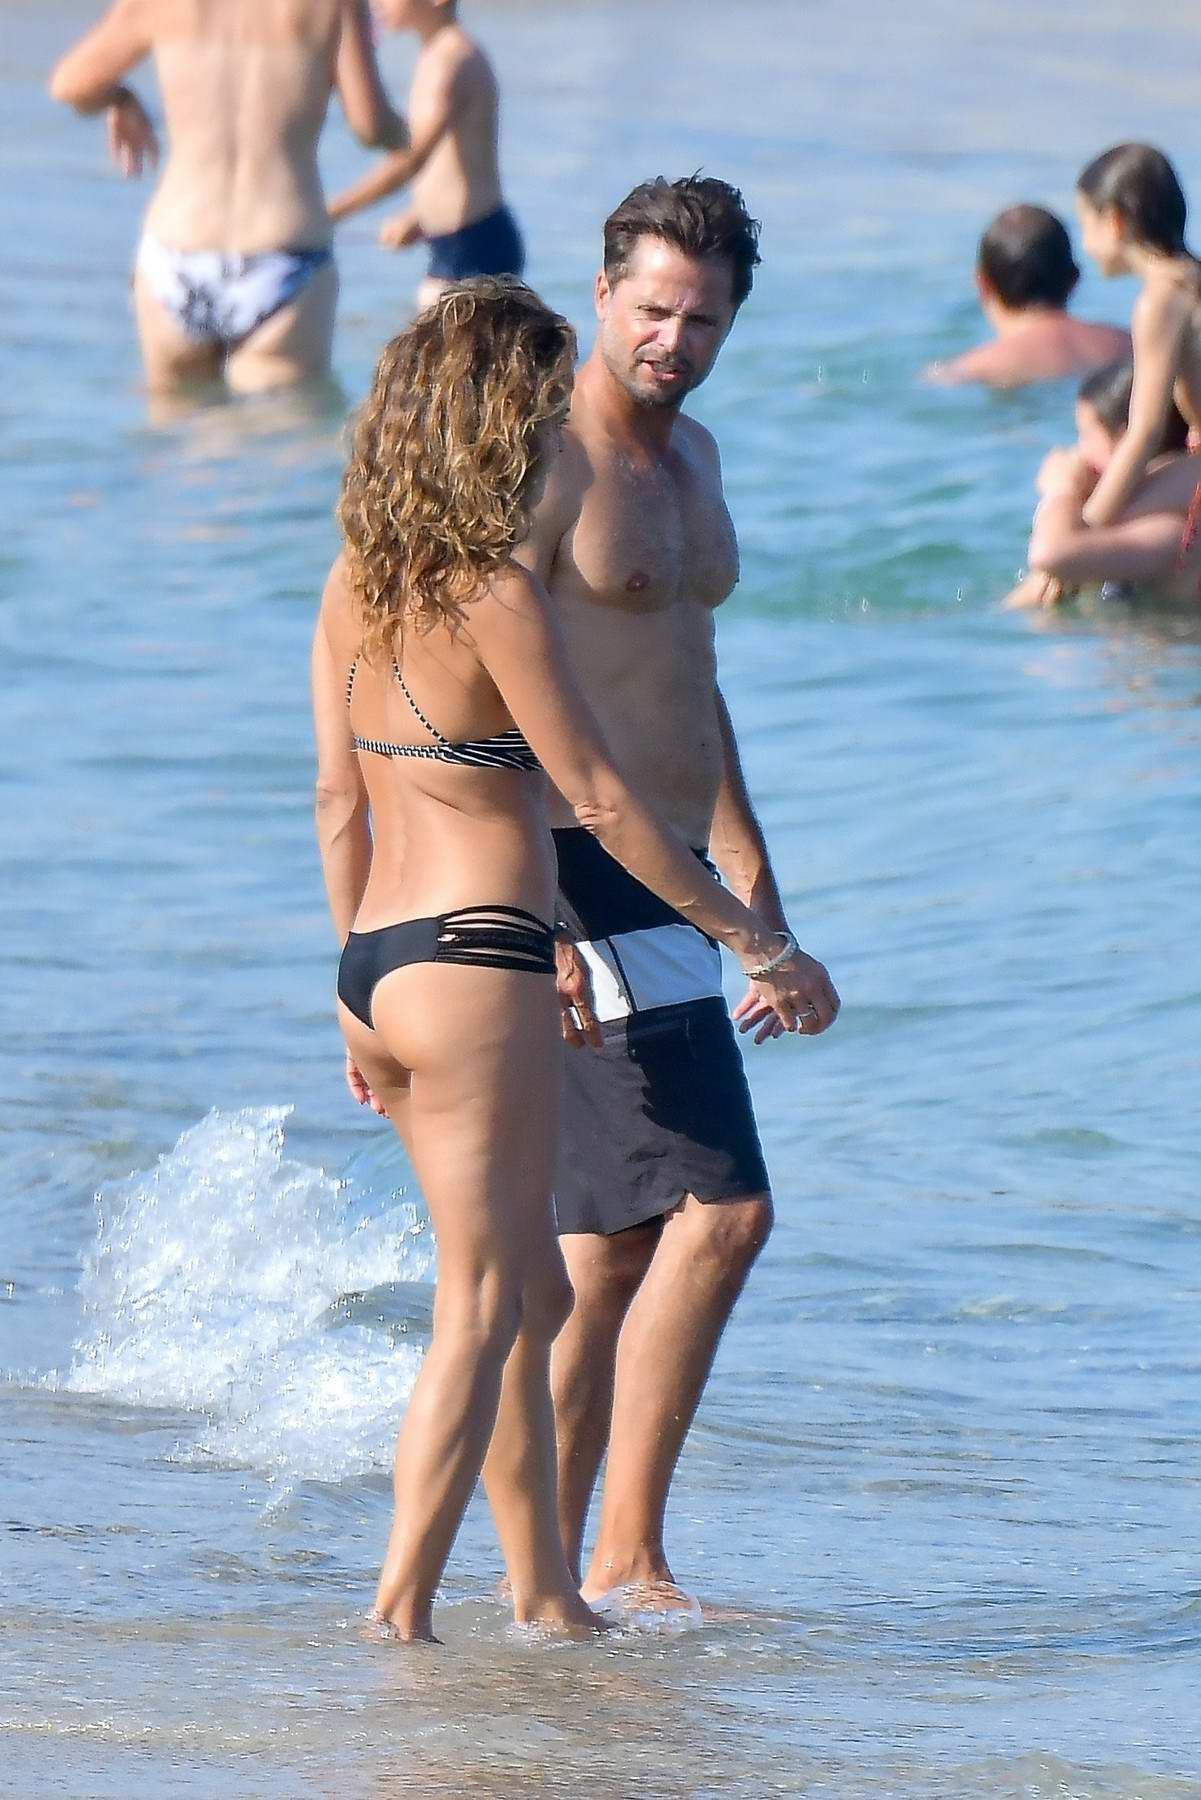 foto Brooke burke bikini pics st tropez